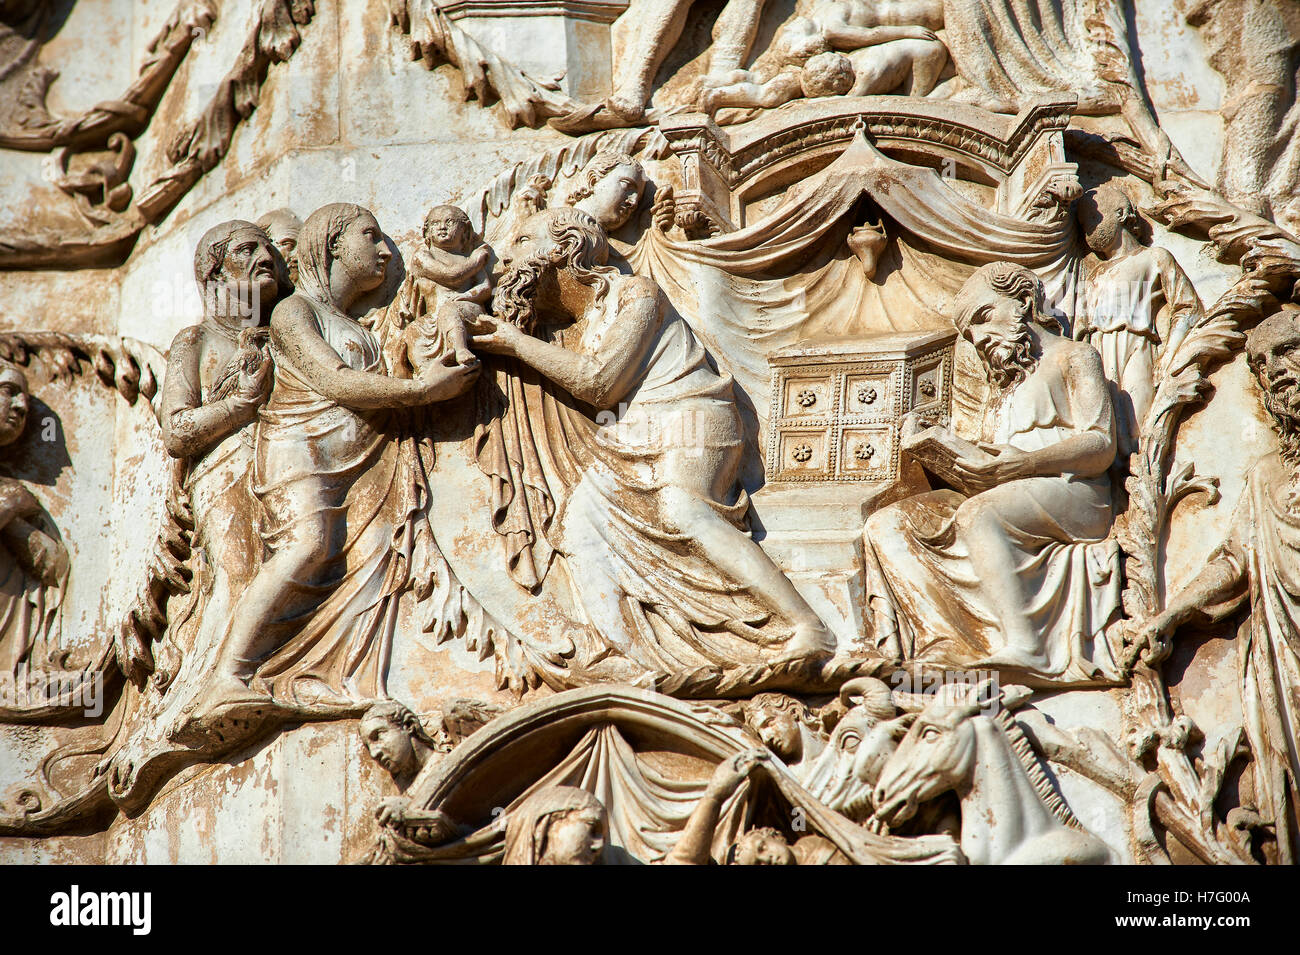 Cristo es presentado en el templo por Maitani circa1310, Toscana, con fachada gótica catedral Duomo Orvieto, Umbría. Foto de stock